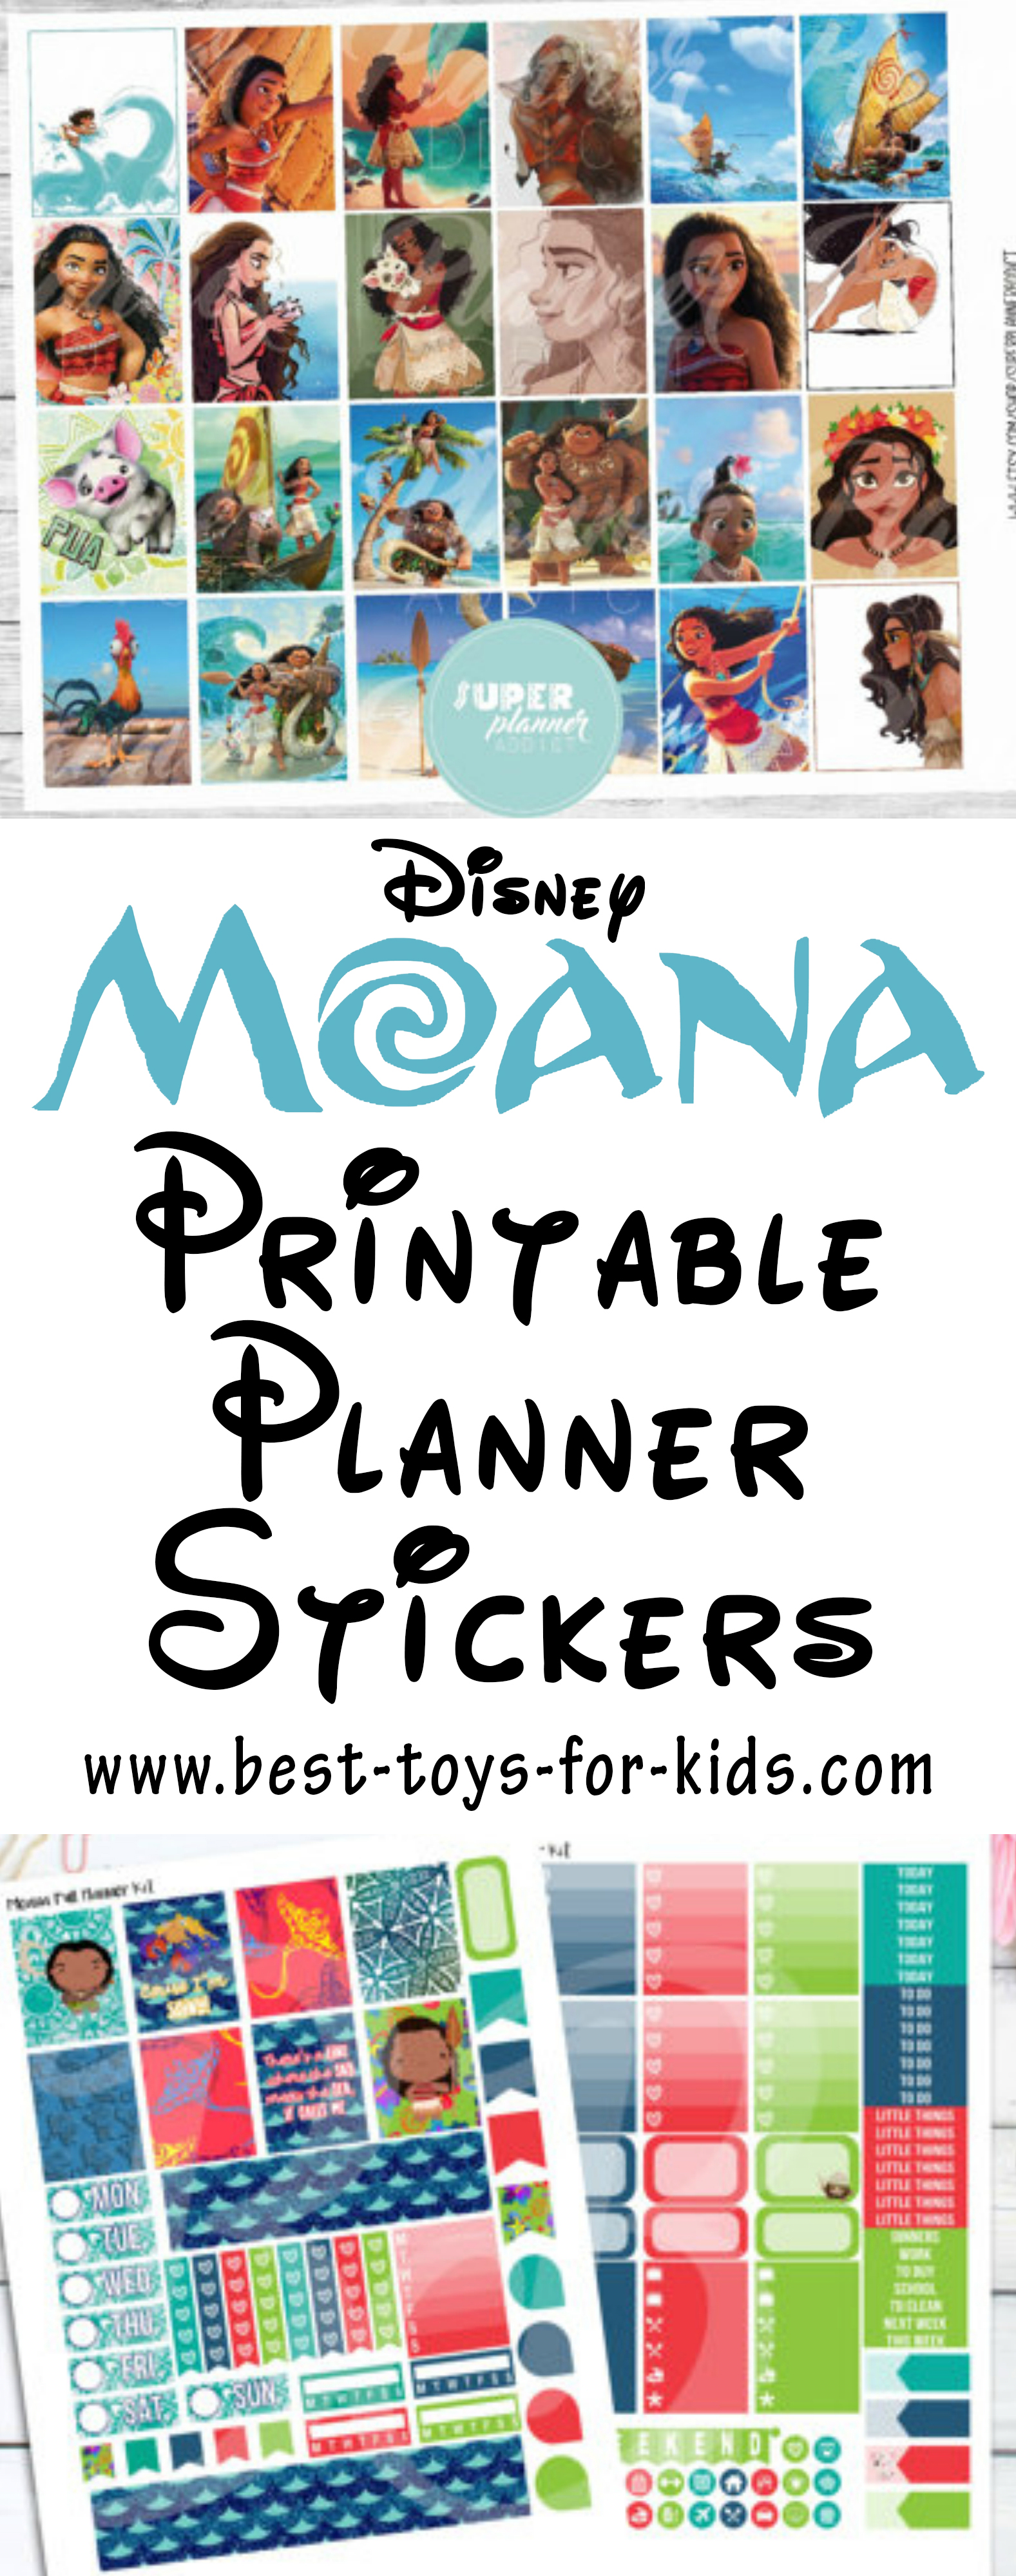 Disney Moana Planner Stickers